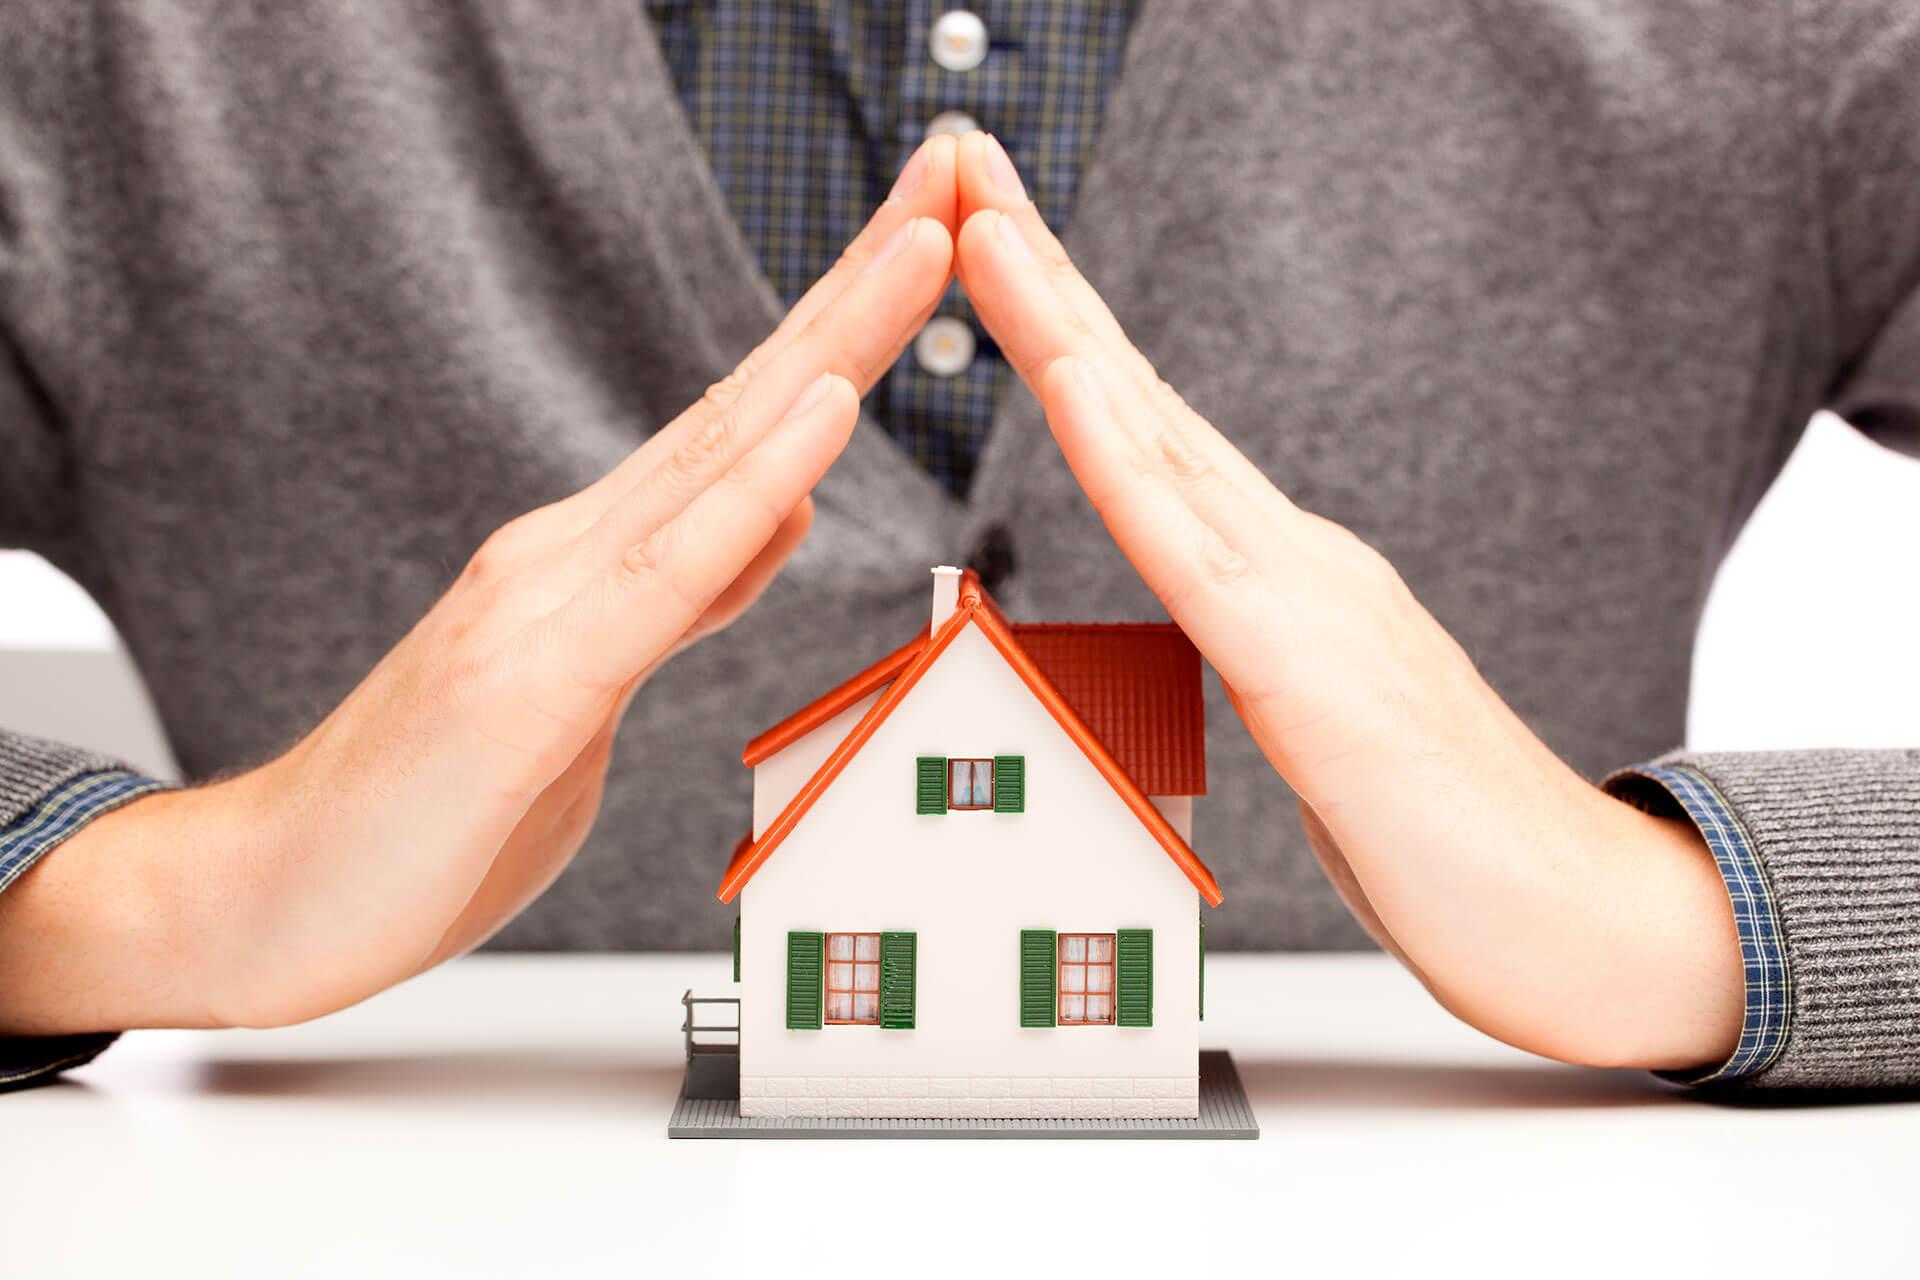 Как уберечь квартиру без хозяина